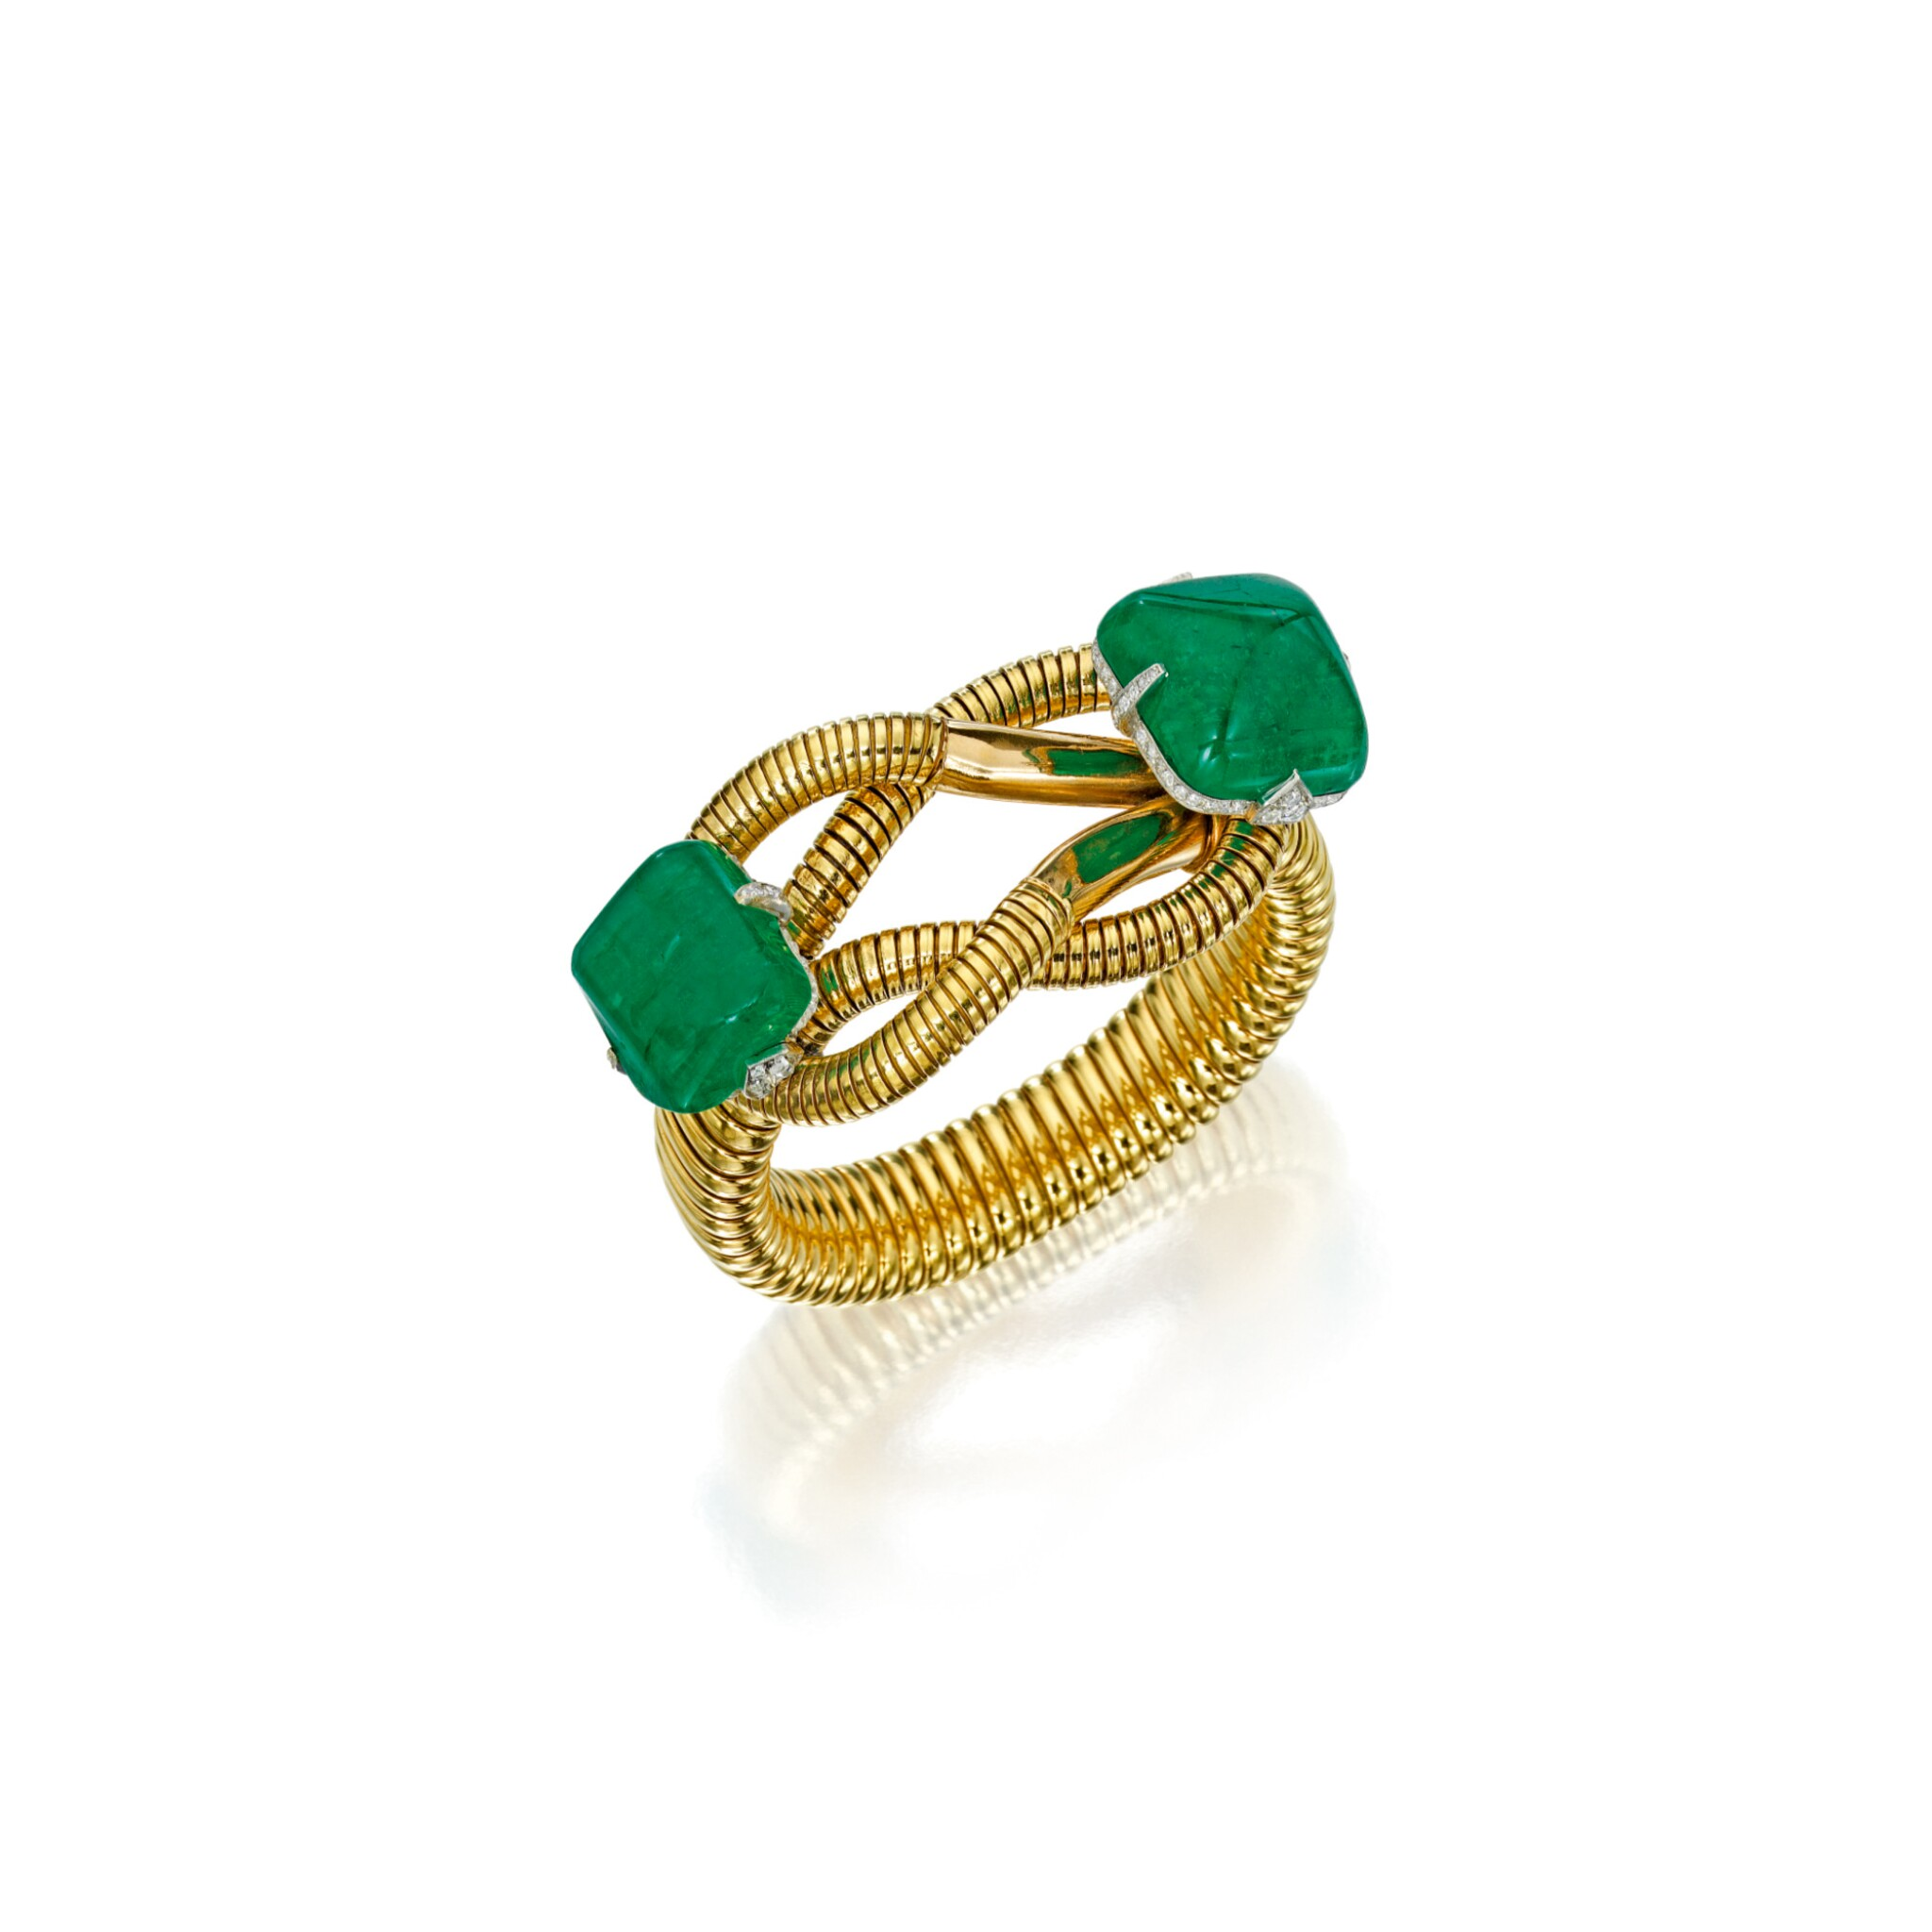 View 1 of Lot 594. GOLD, EMERALD AND DIAMOND BRACELET, CARTIER | 黃金鑲祖母綠配鑽石手鏈,卡地亞.